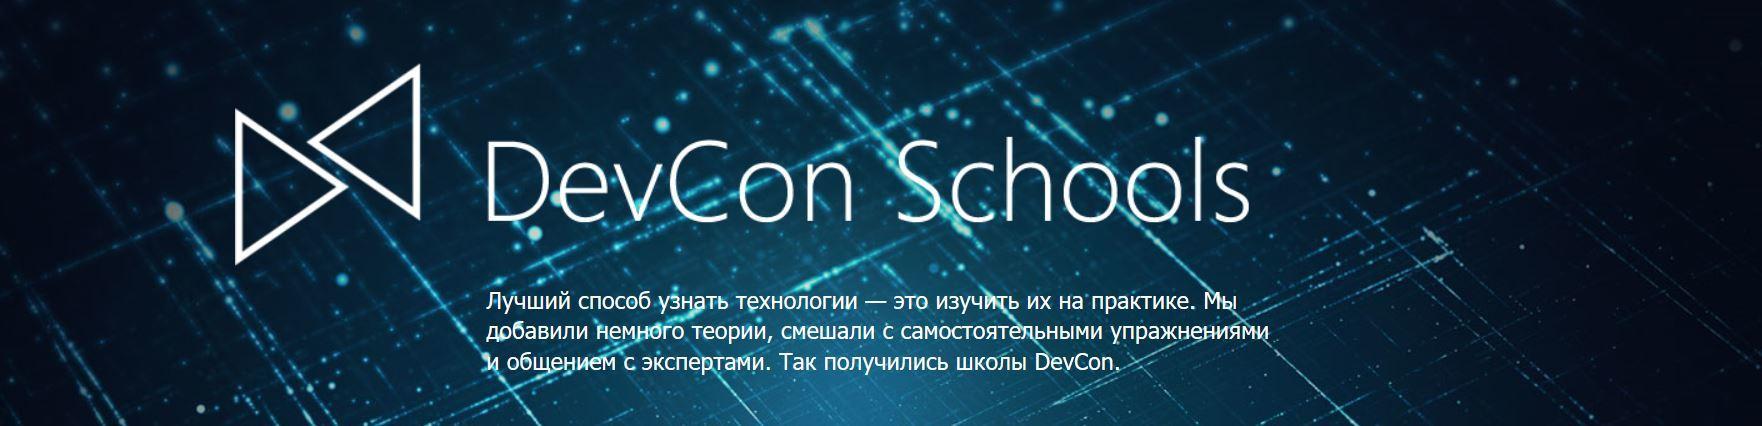 Школа DevCon: Технологии будущего, 1ноября (Москва)